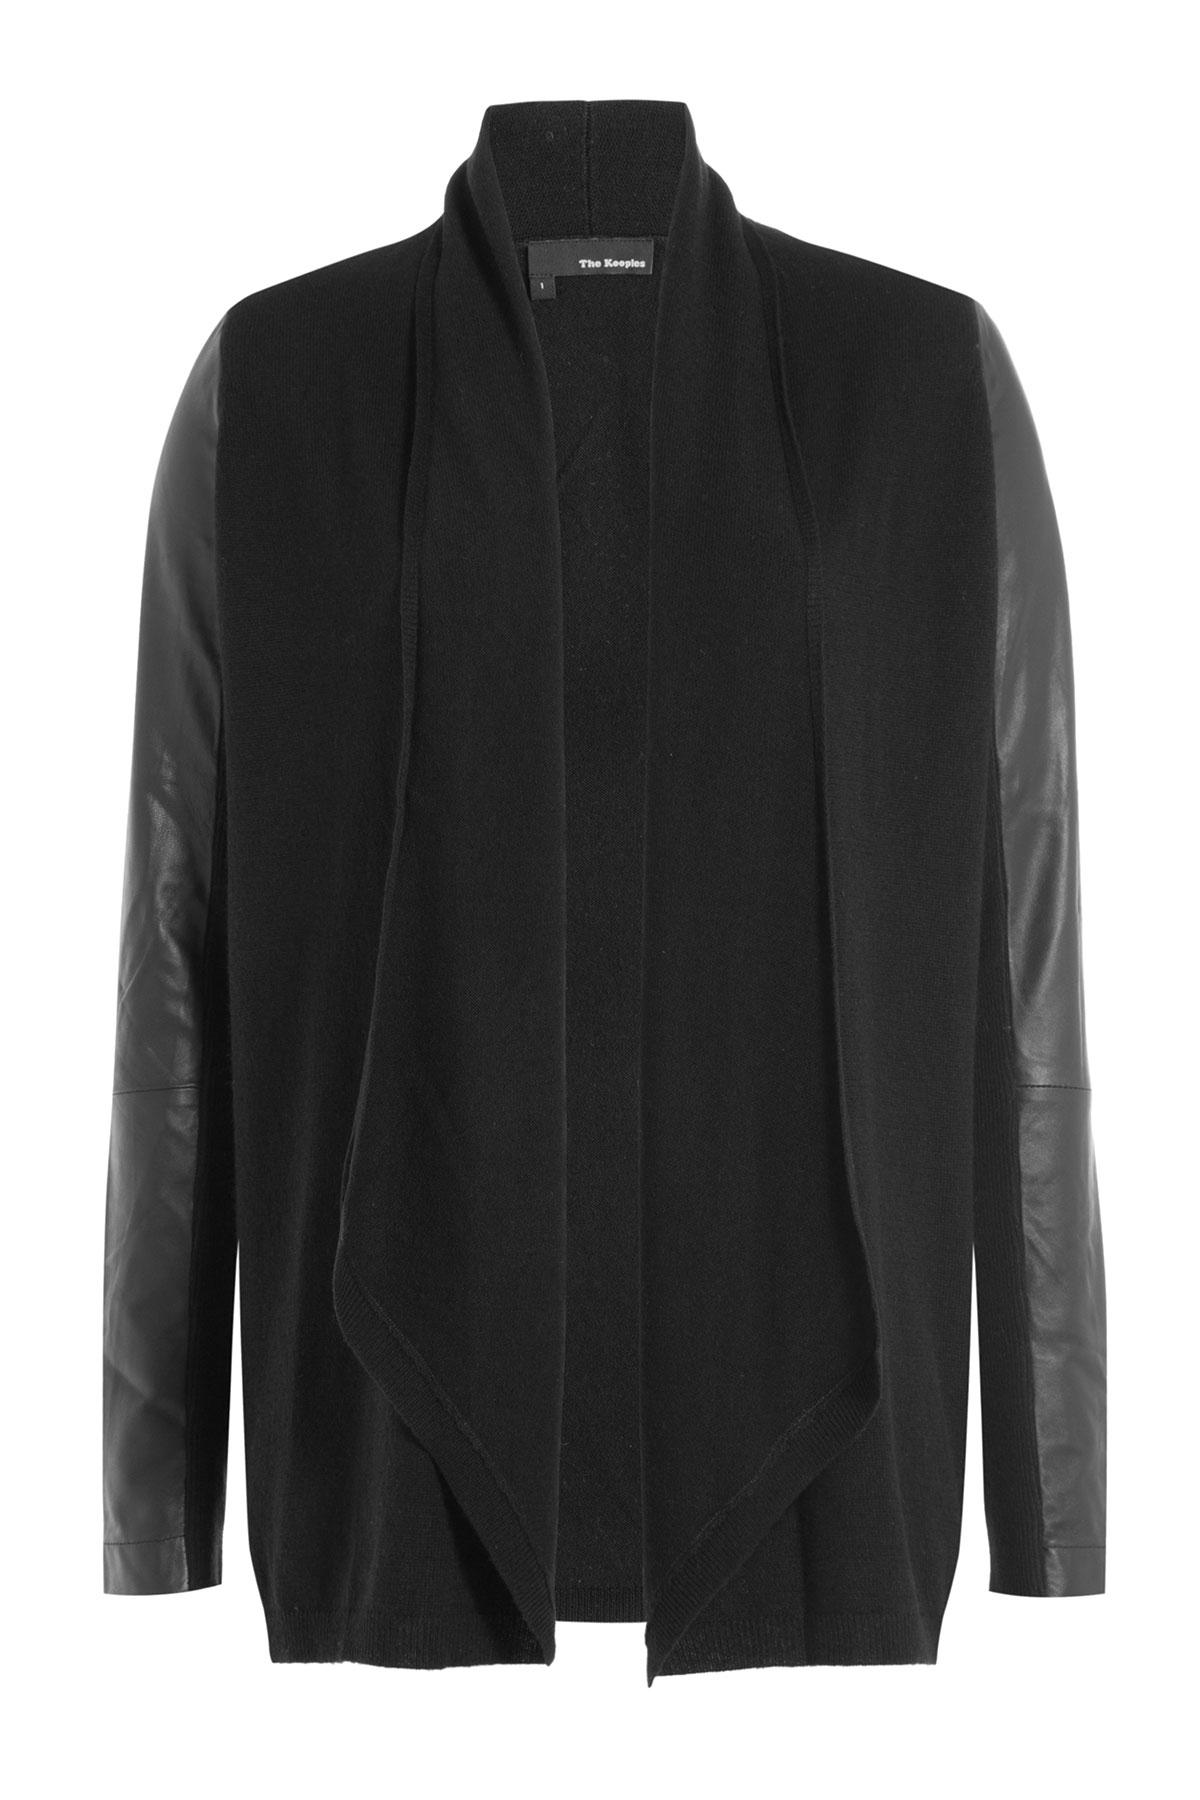 The kooples Merino Wool And Faux Leather Cardigan - Black in Black ...